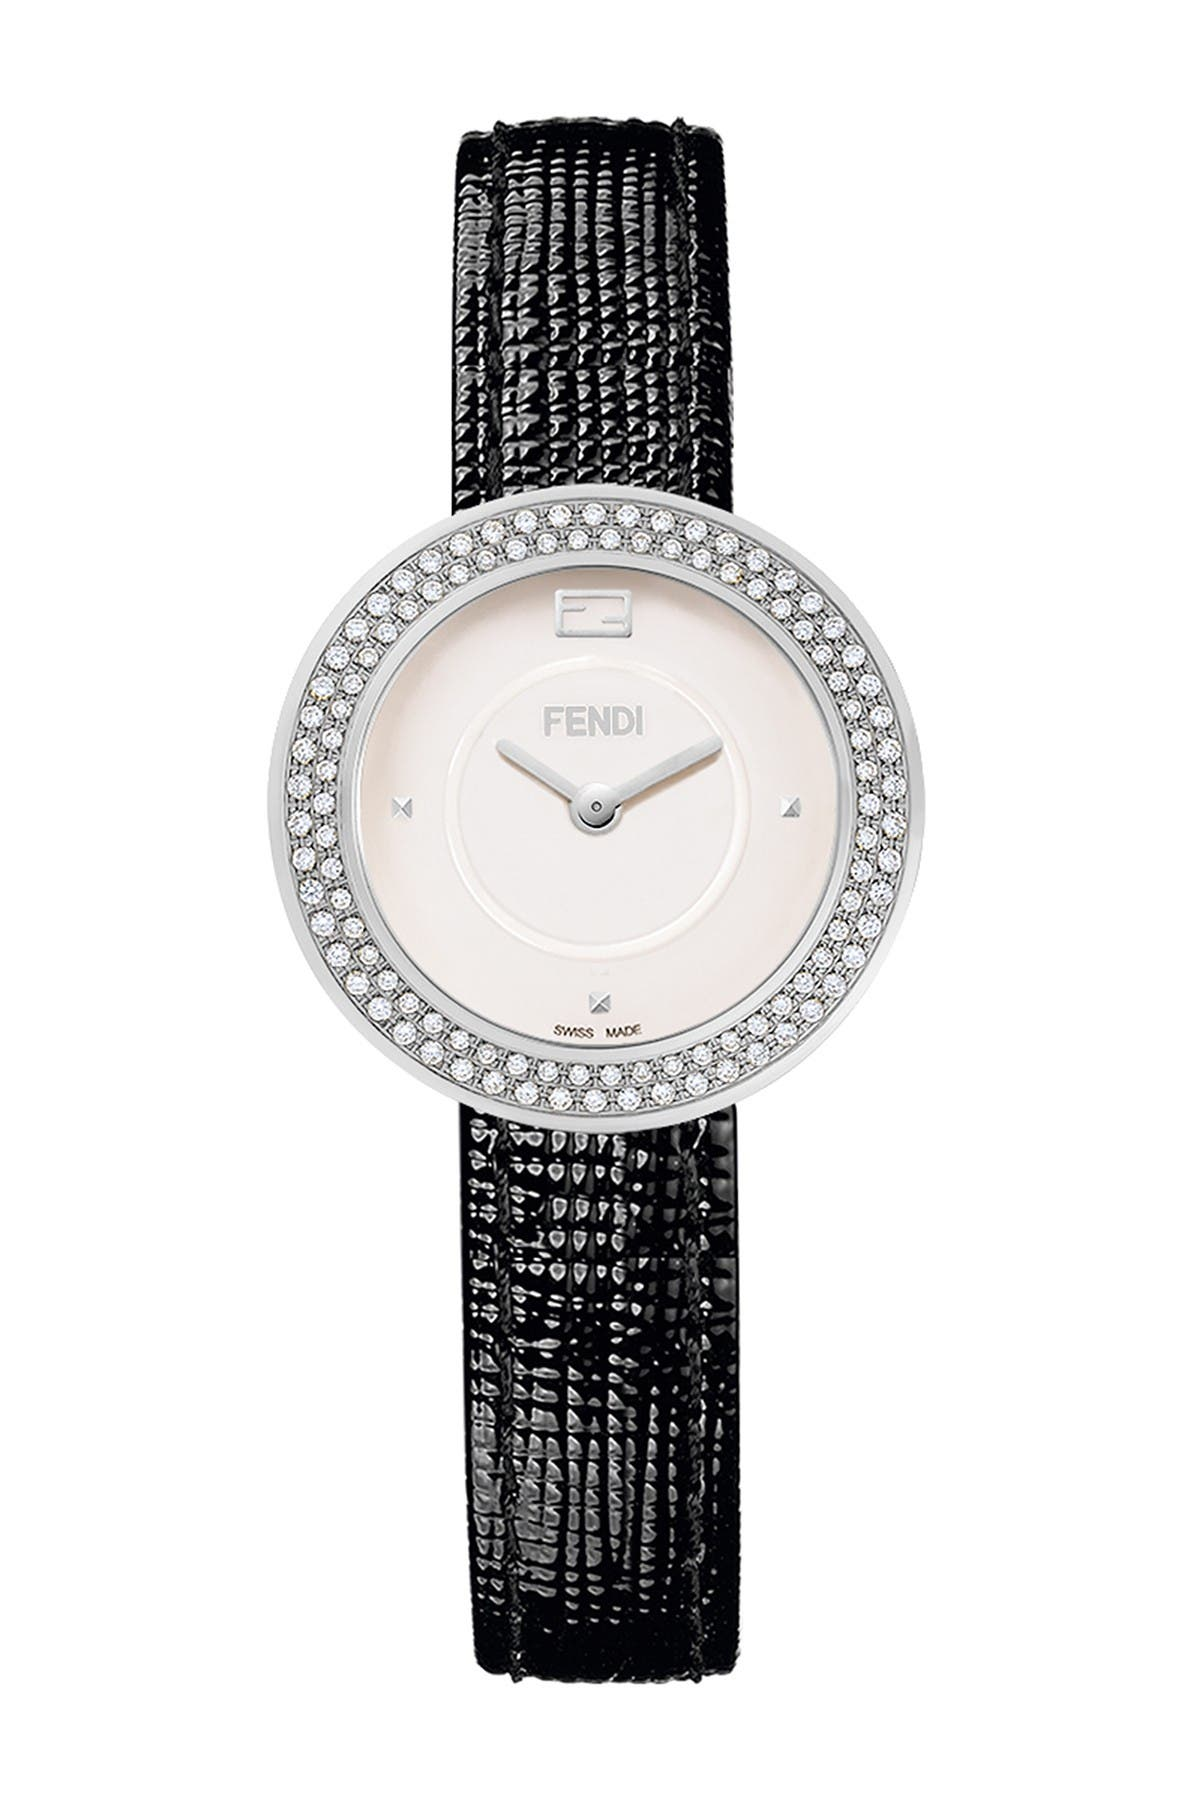 Image of FENDI Womens Fendi My Way Leather Strap Watch, 28mm - 0.45 ctw